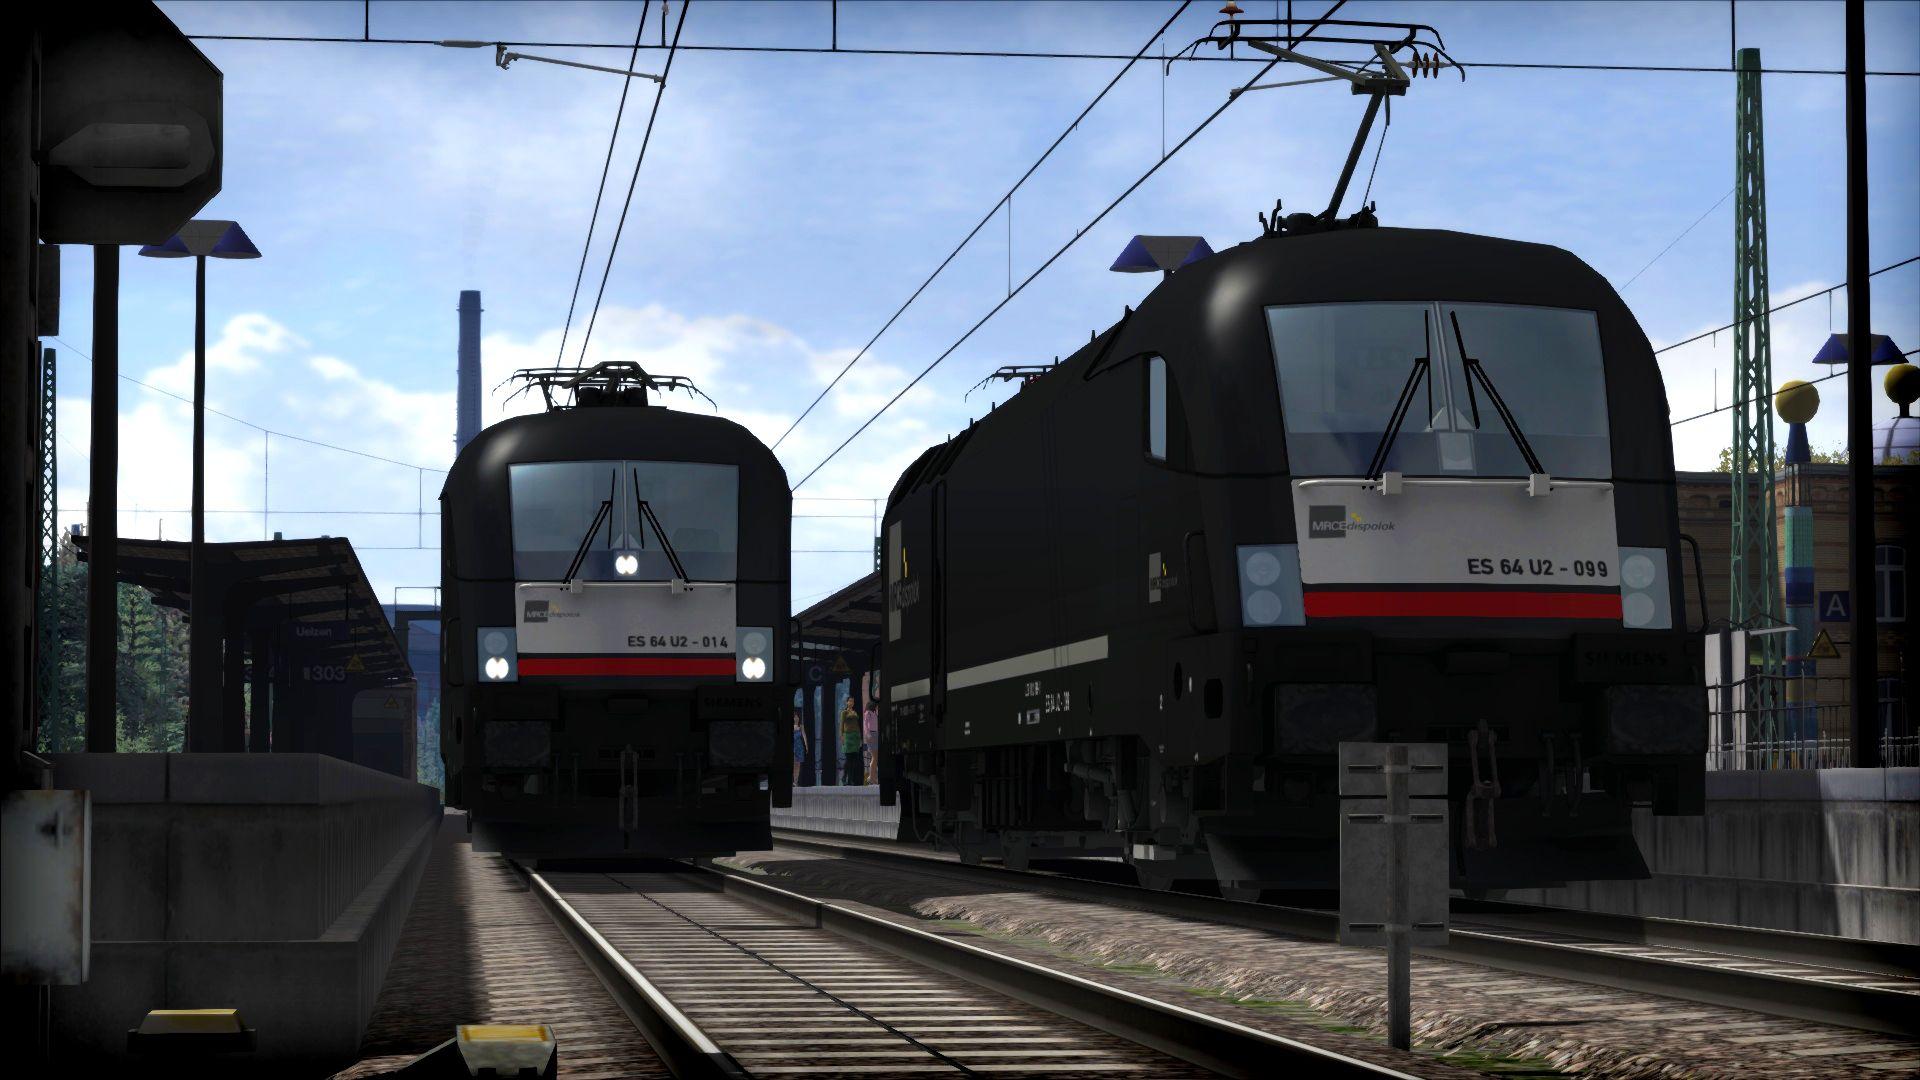 ES641